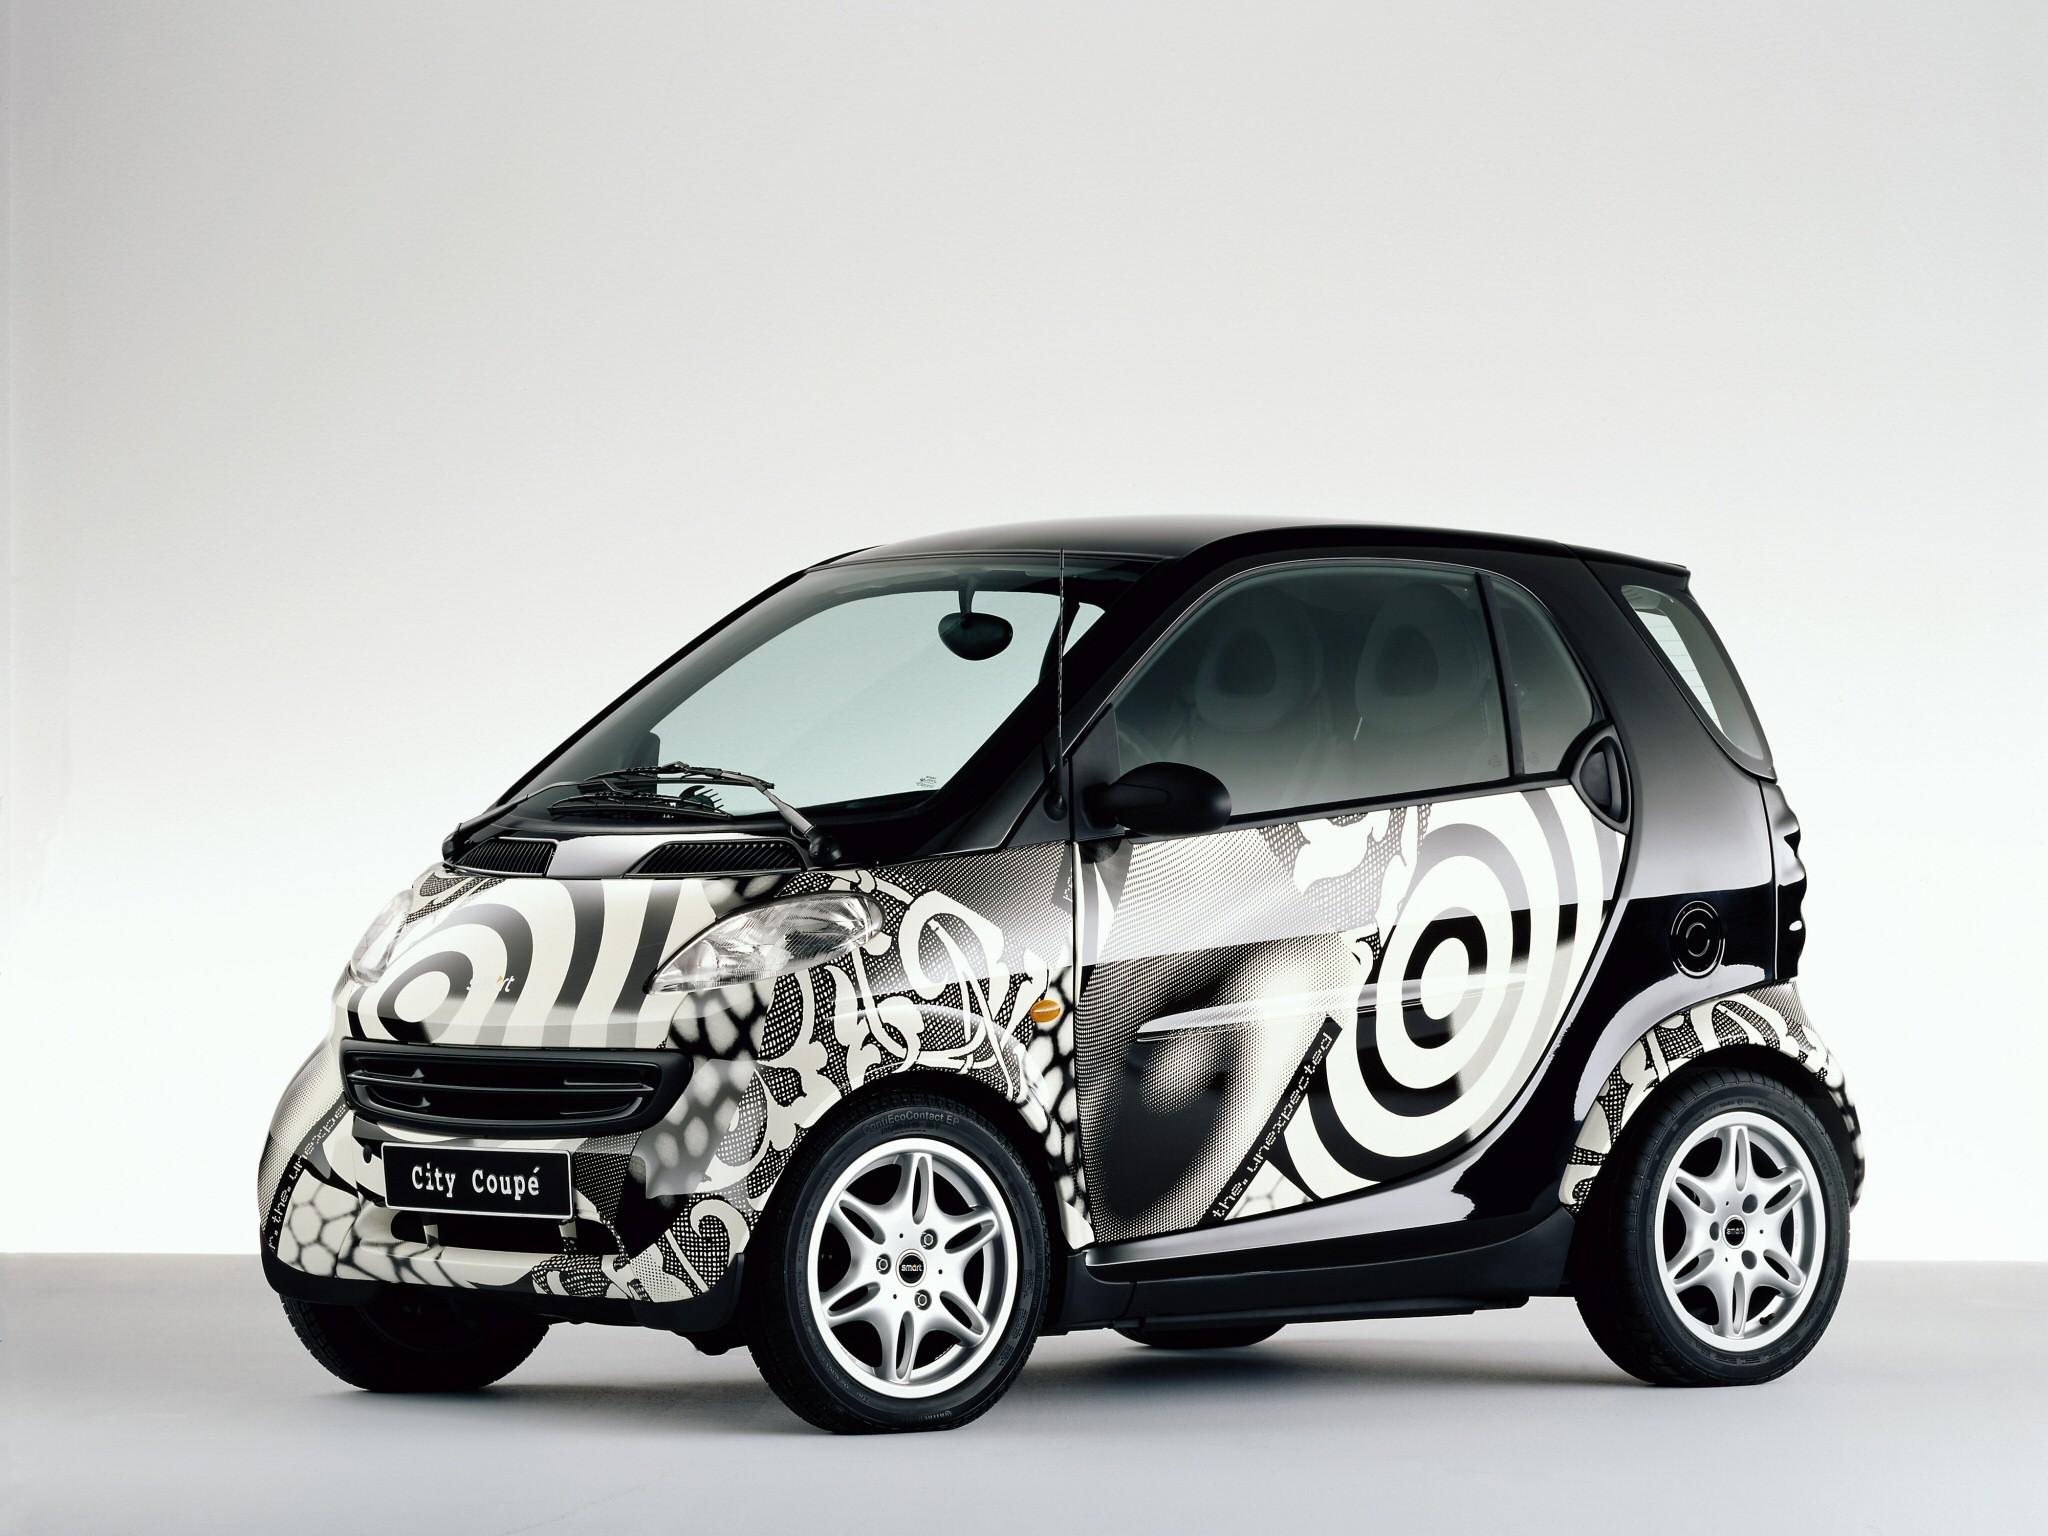 Front Wheel Drive Cars >> SMART City Coupe specs - 1998, 1999, 2000, 2001, 2002 - autoevolution